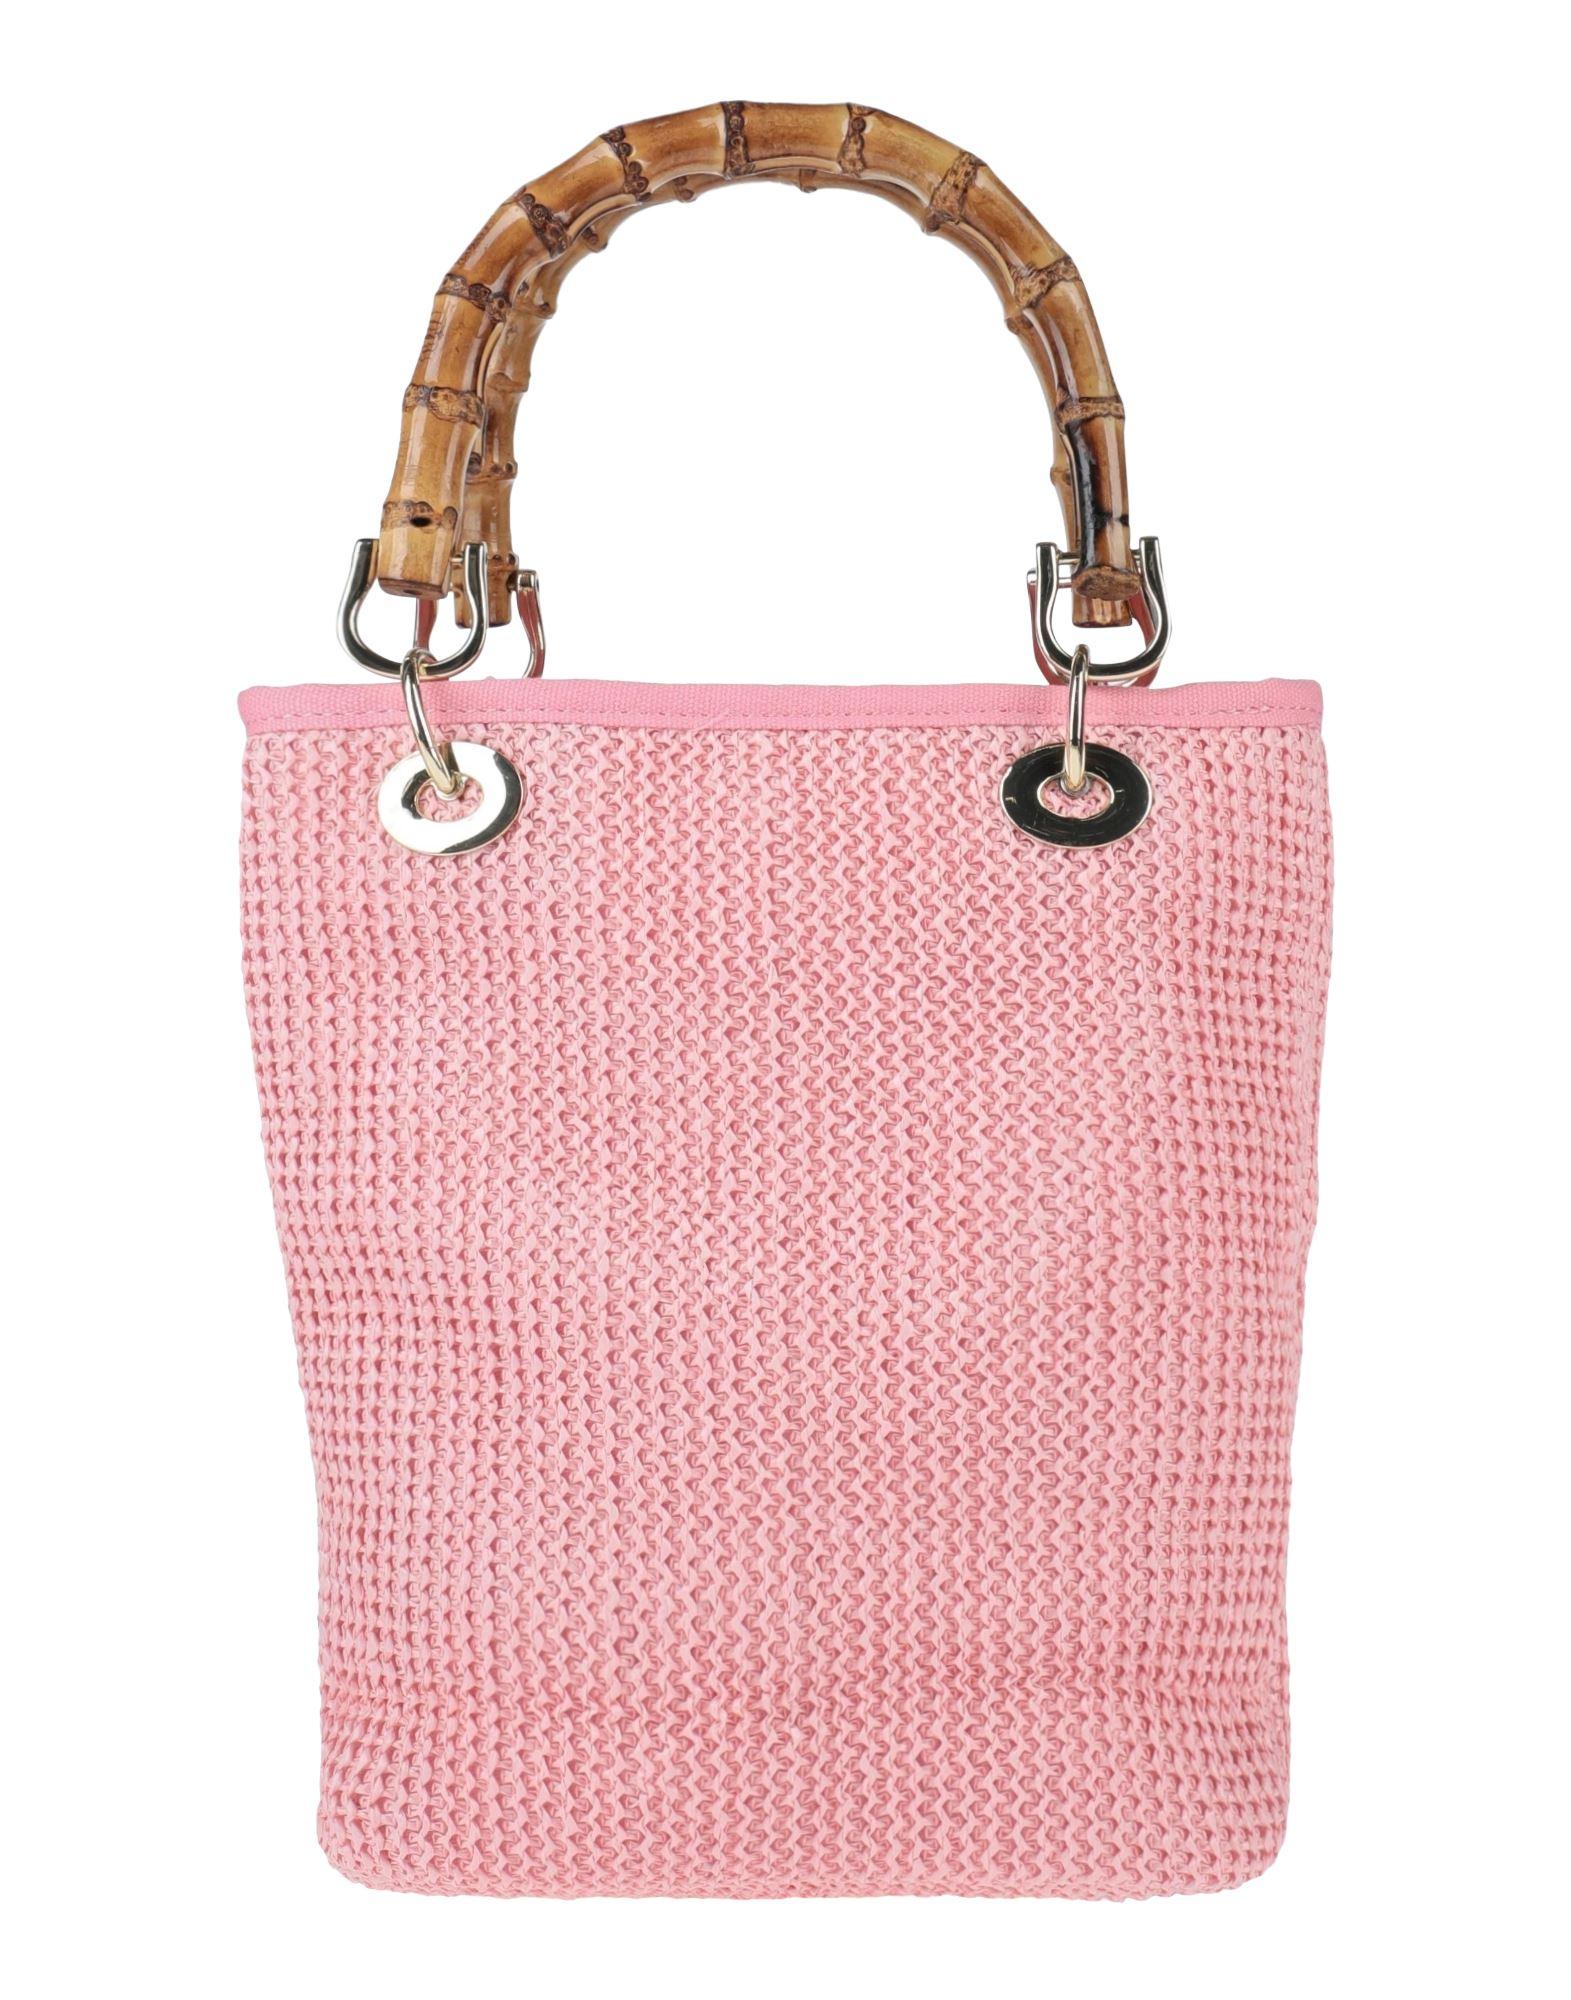 mia bag сумка на руку MIA BAG Сумка на руку